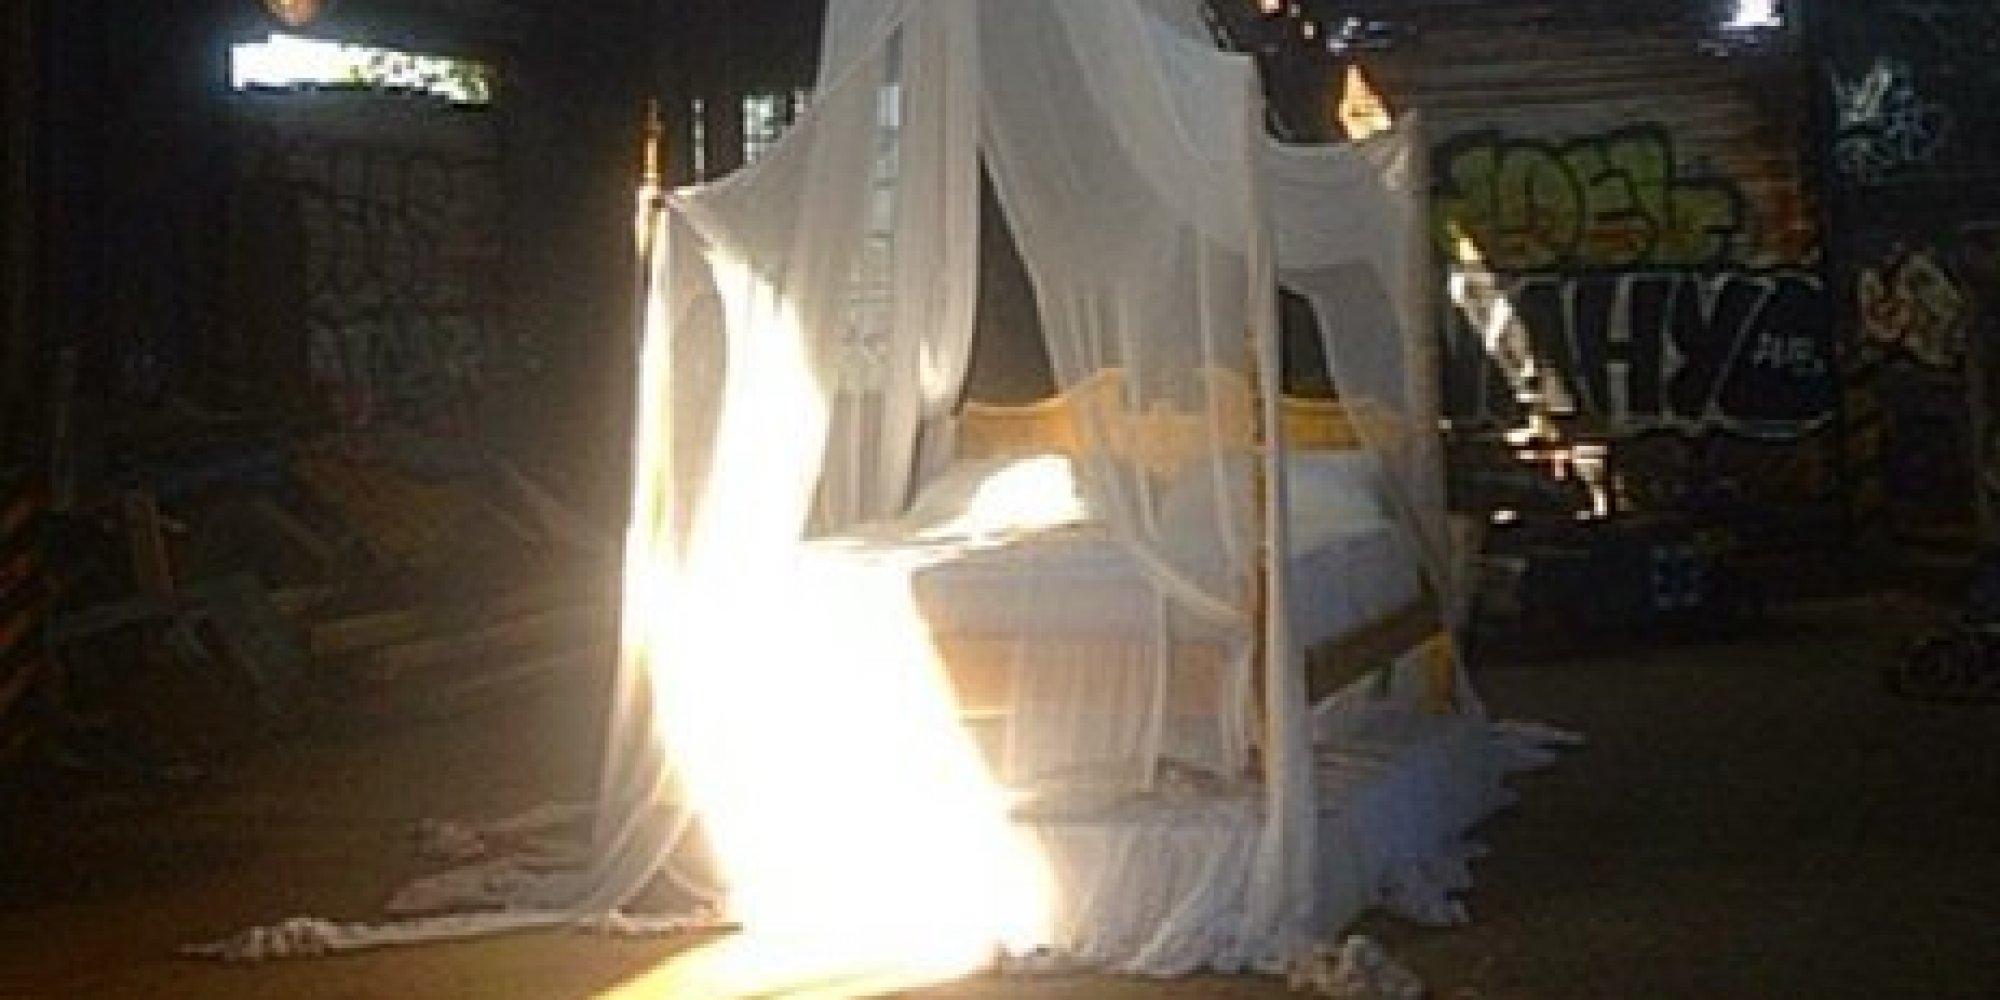 Patti Smith Brings An Artsy Bed To Rockaway Beach